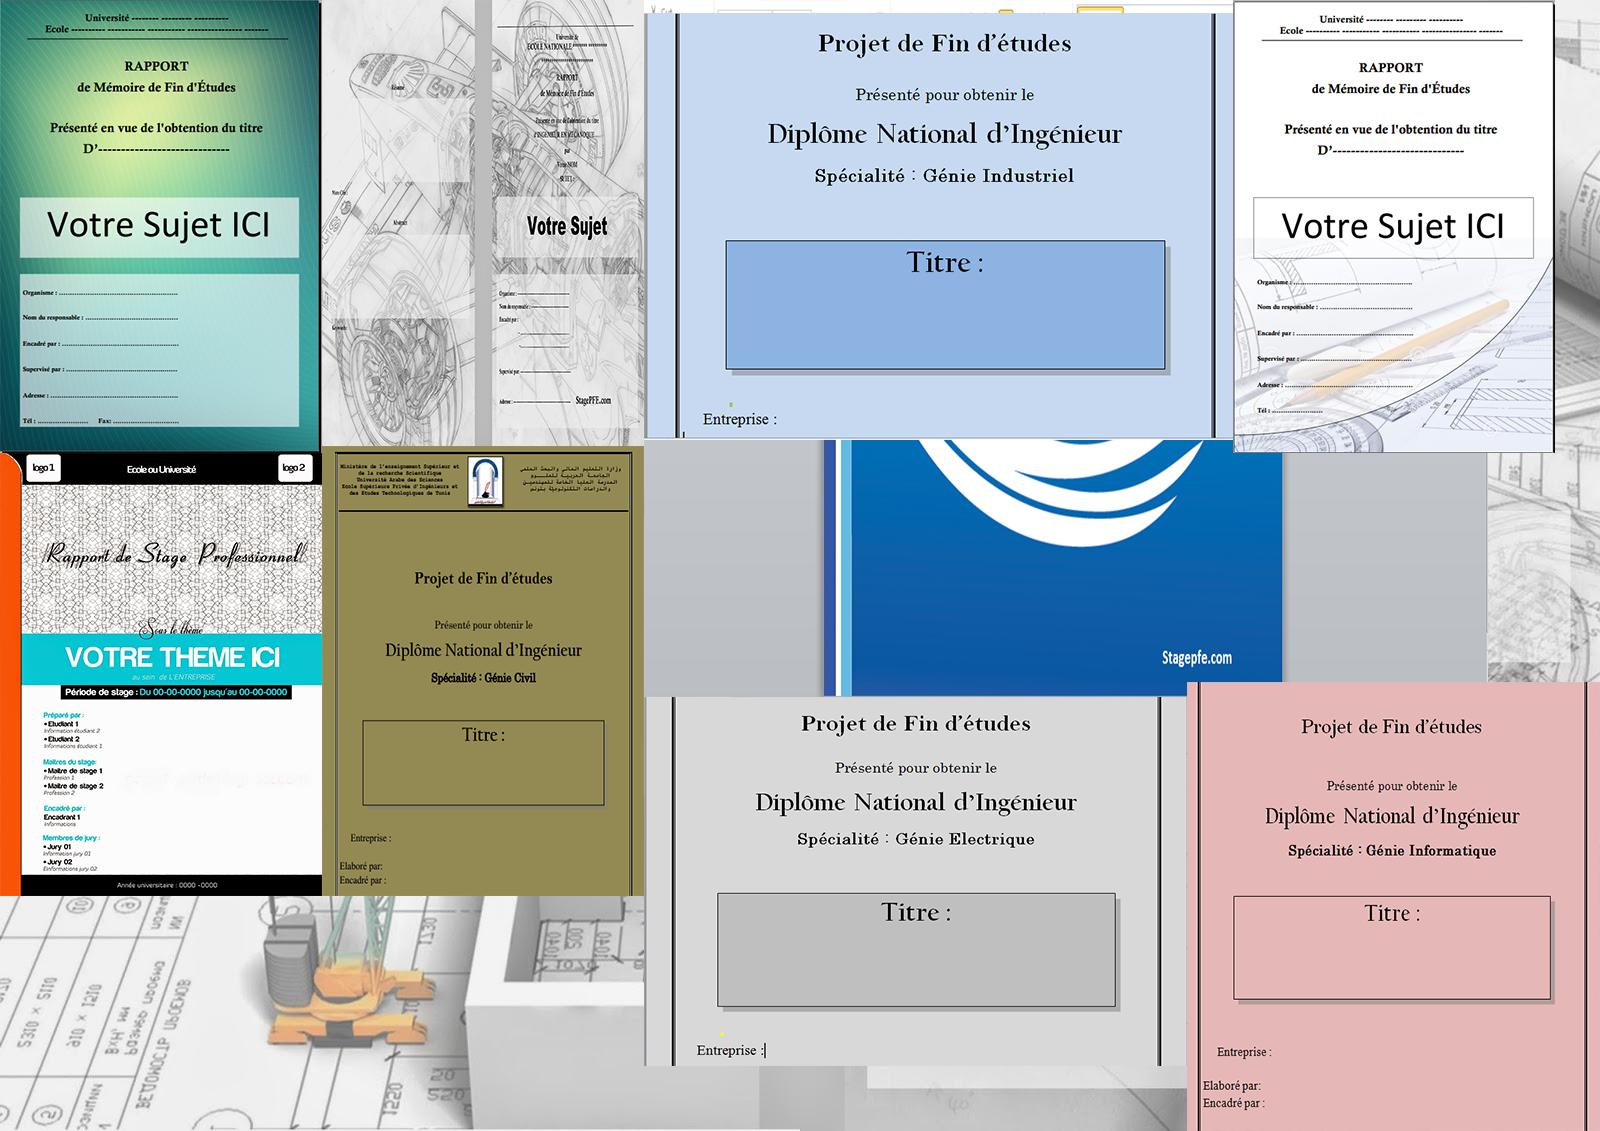 نماذج باج دوقارد Page De Garde للمذكرات و البحوث ديزاد ويكي